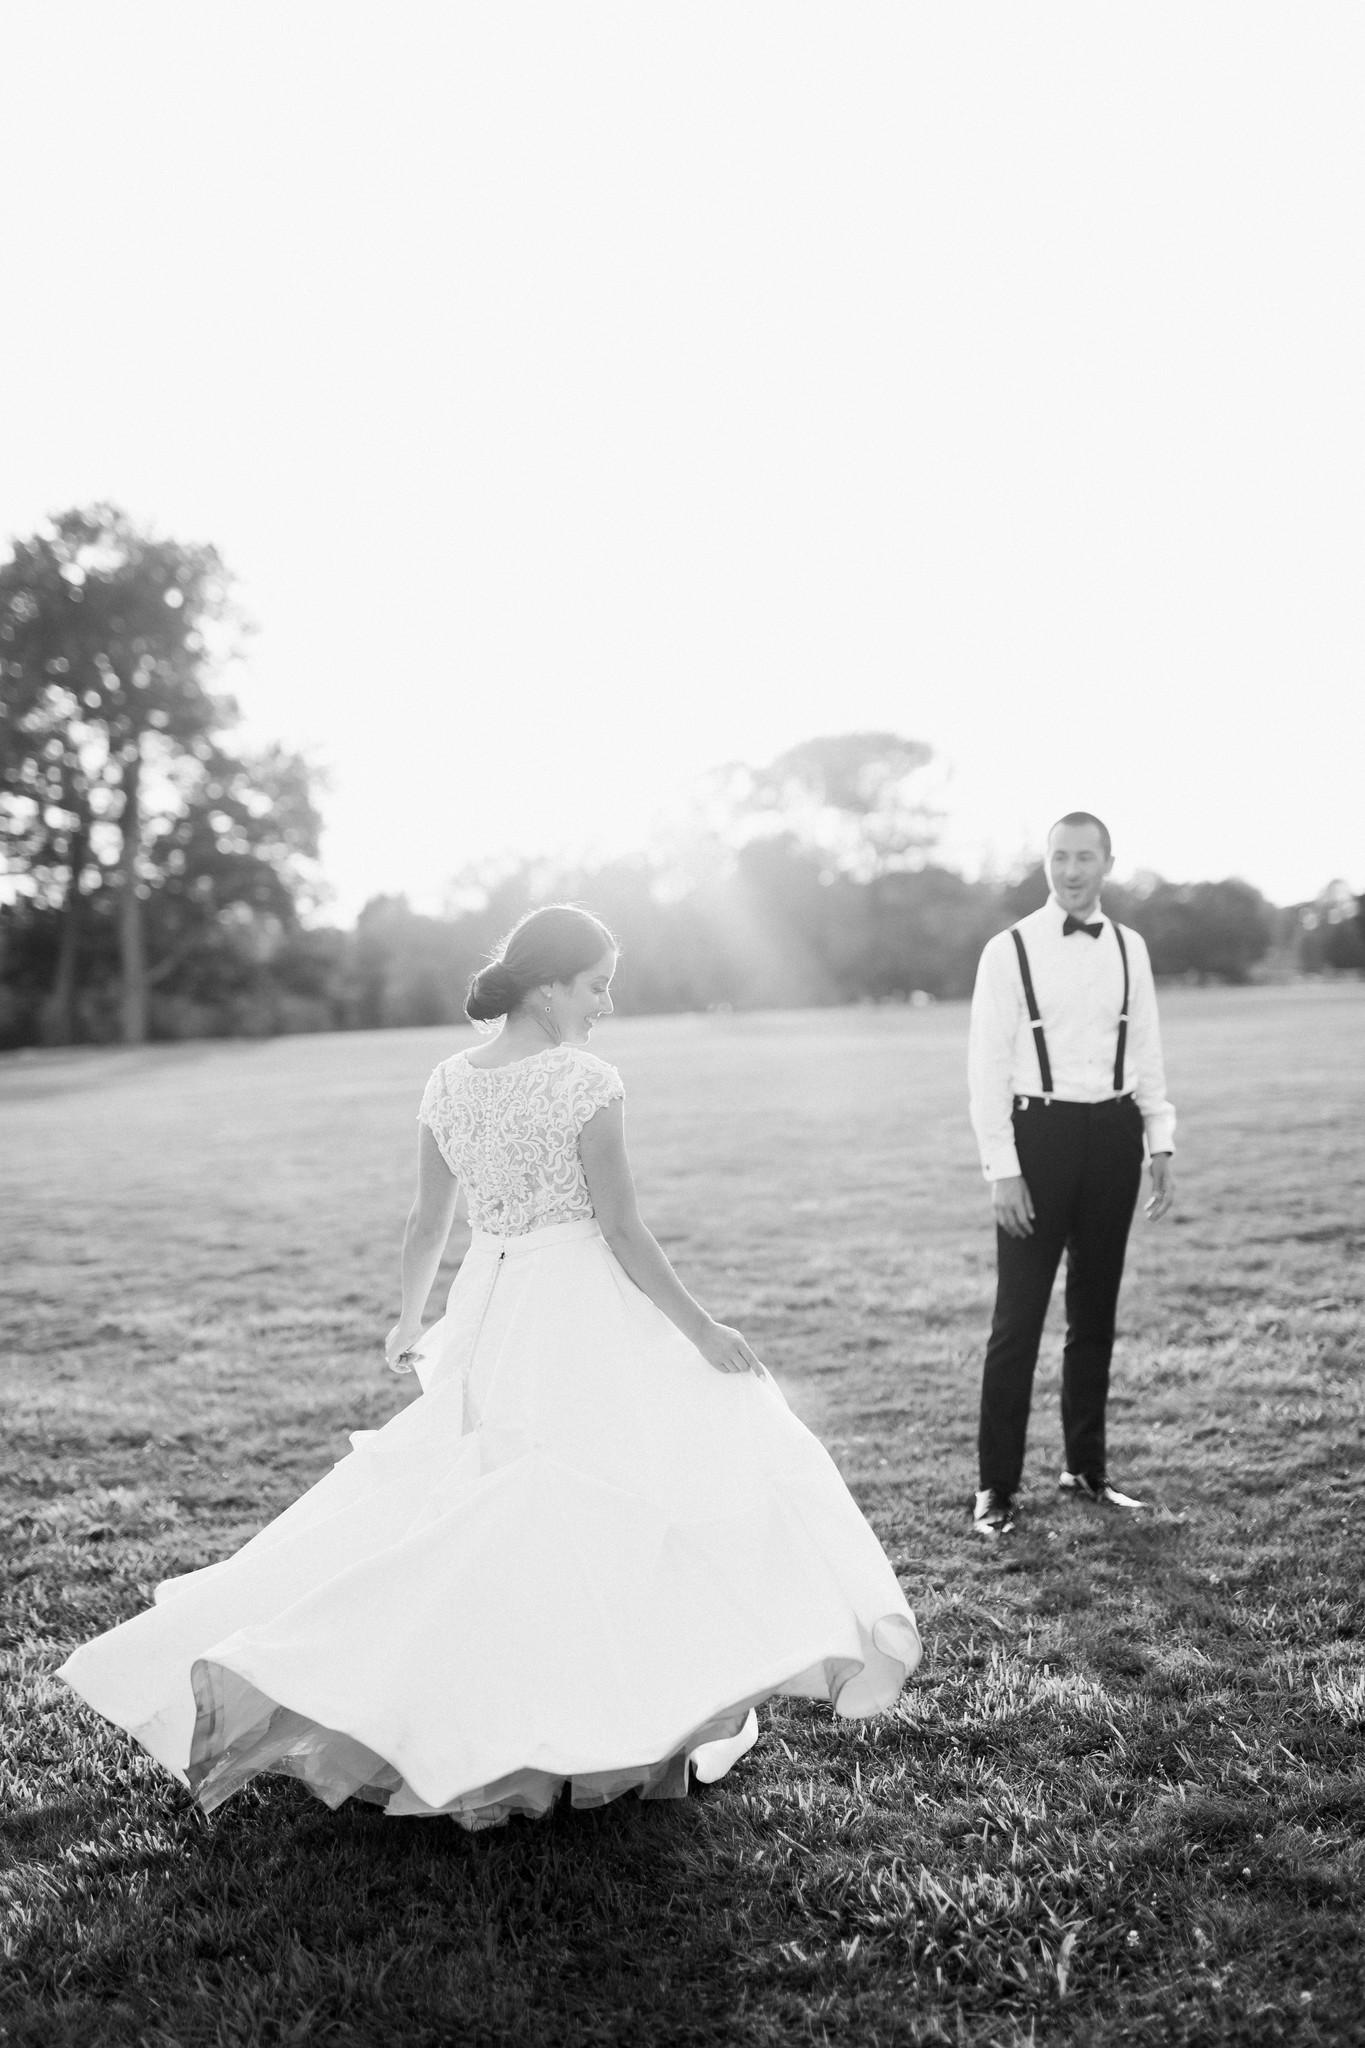 waveny park wedding_iconic wedding photos_CT wedding_gallaher mansion wedding_CT wedding photographer-4.jpg